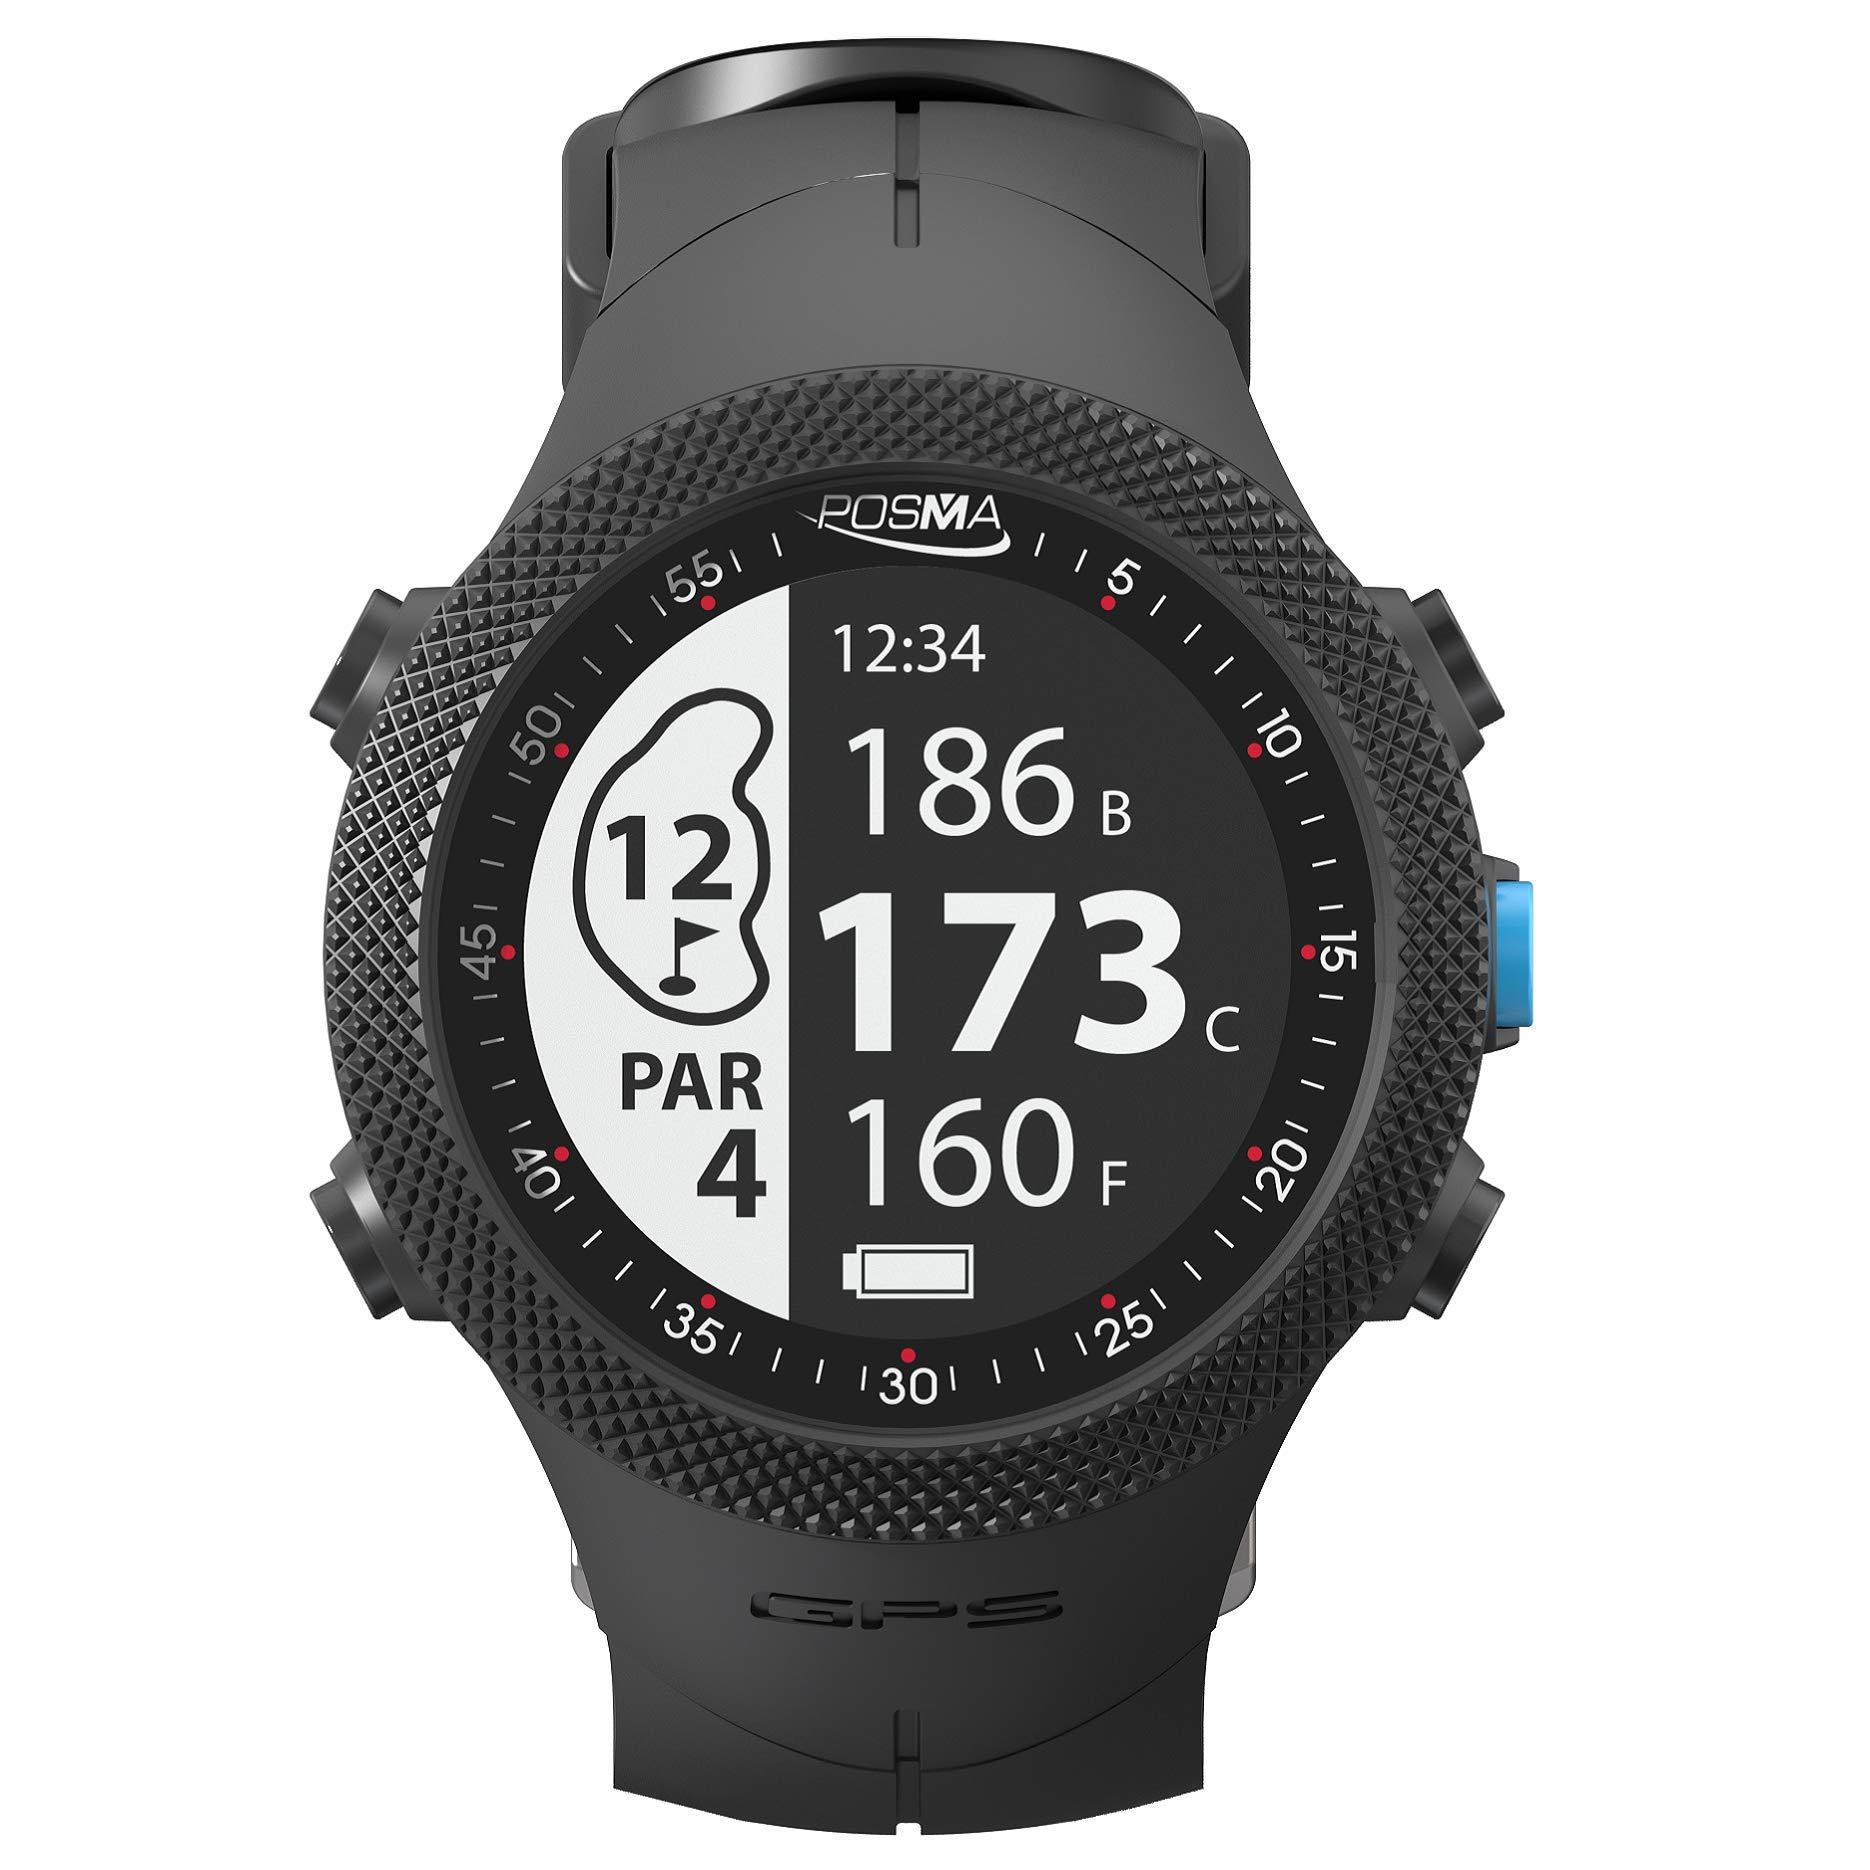 POSMA GB3 Golf Triathlon Sport GPS Watch - Range Finder - Running Cycling Swimming Smart GPS Watch - Android iOS app by POSMA